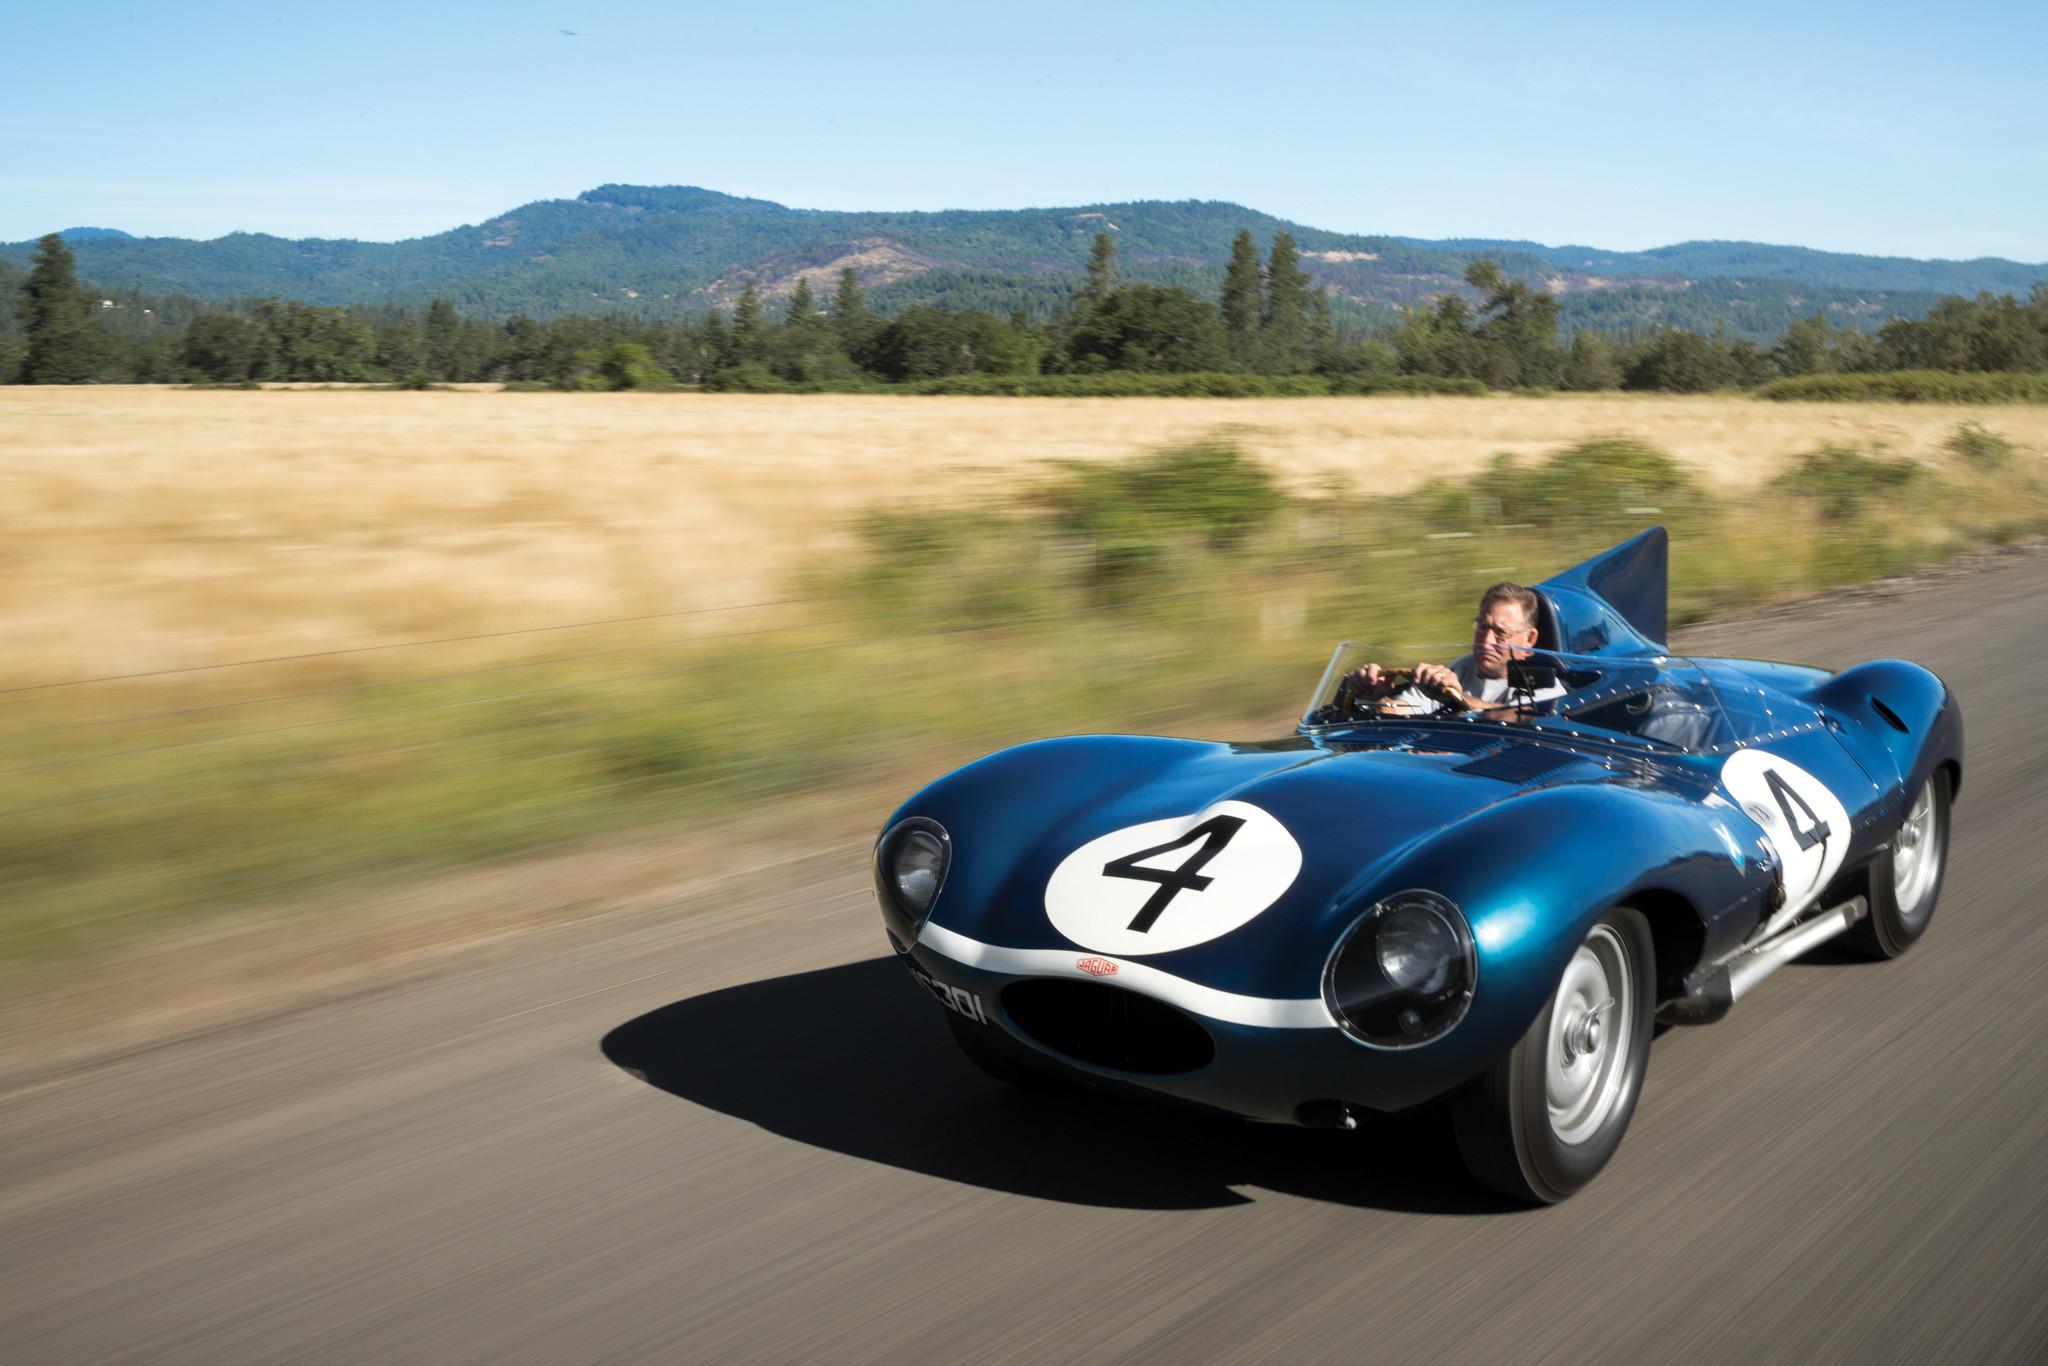 Pebble Beach 2016 Multimillion Dollar Race Cars Zoom Into